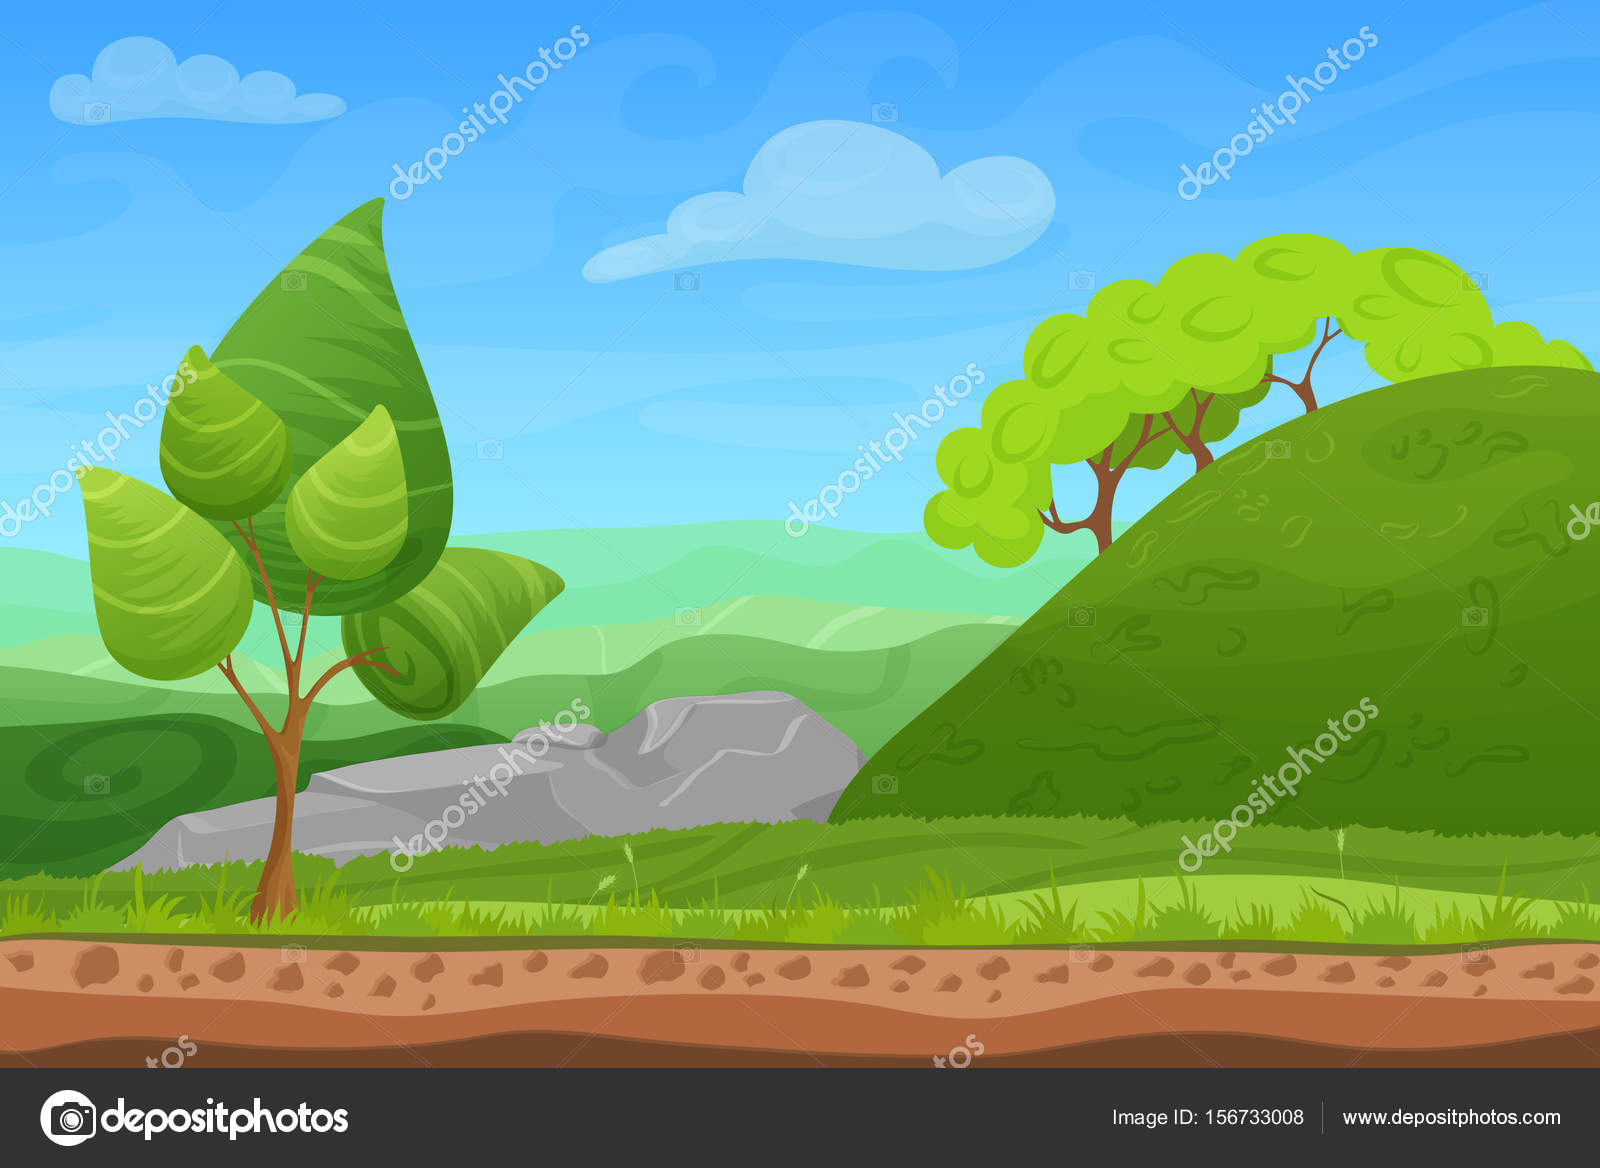 Dibujos De Arboles Coloreados: Dibujos Animados Color Naturaleza Paisaje De Verano De